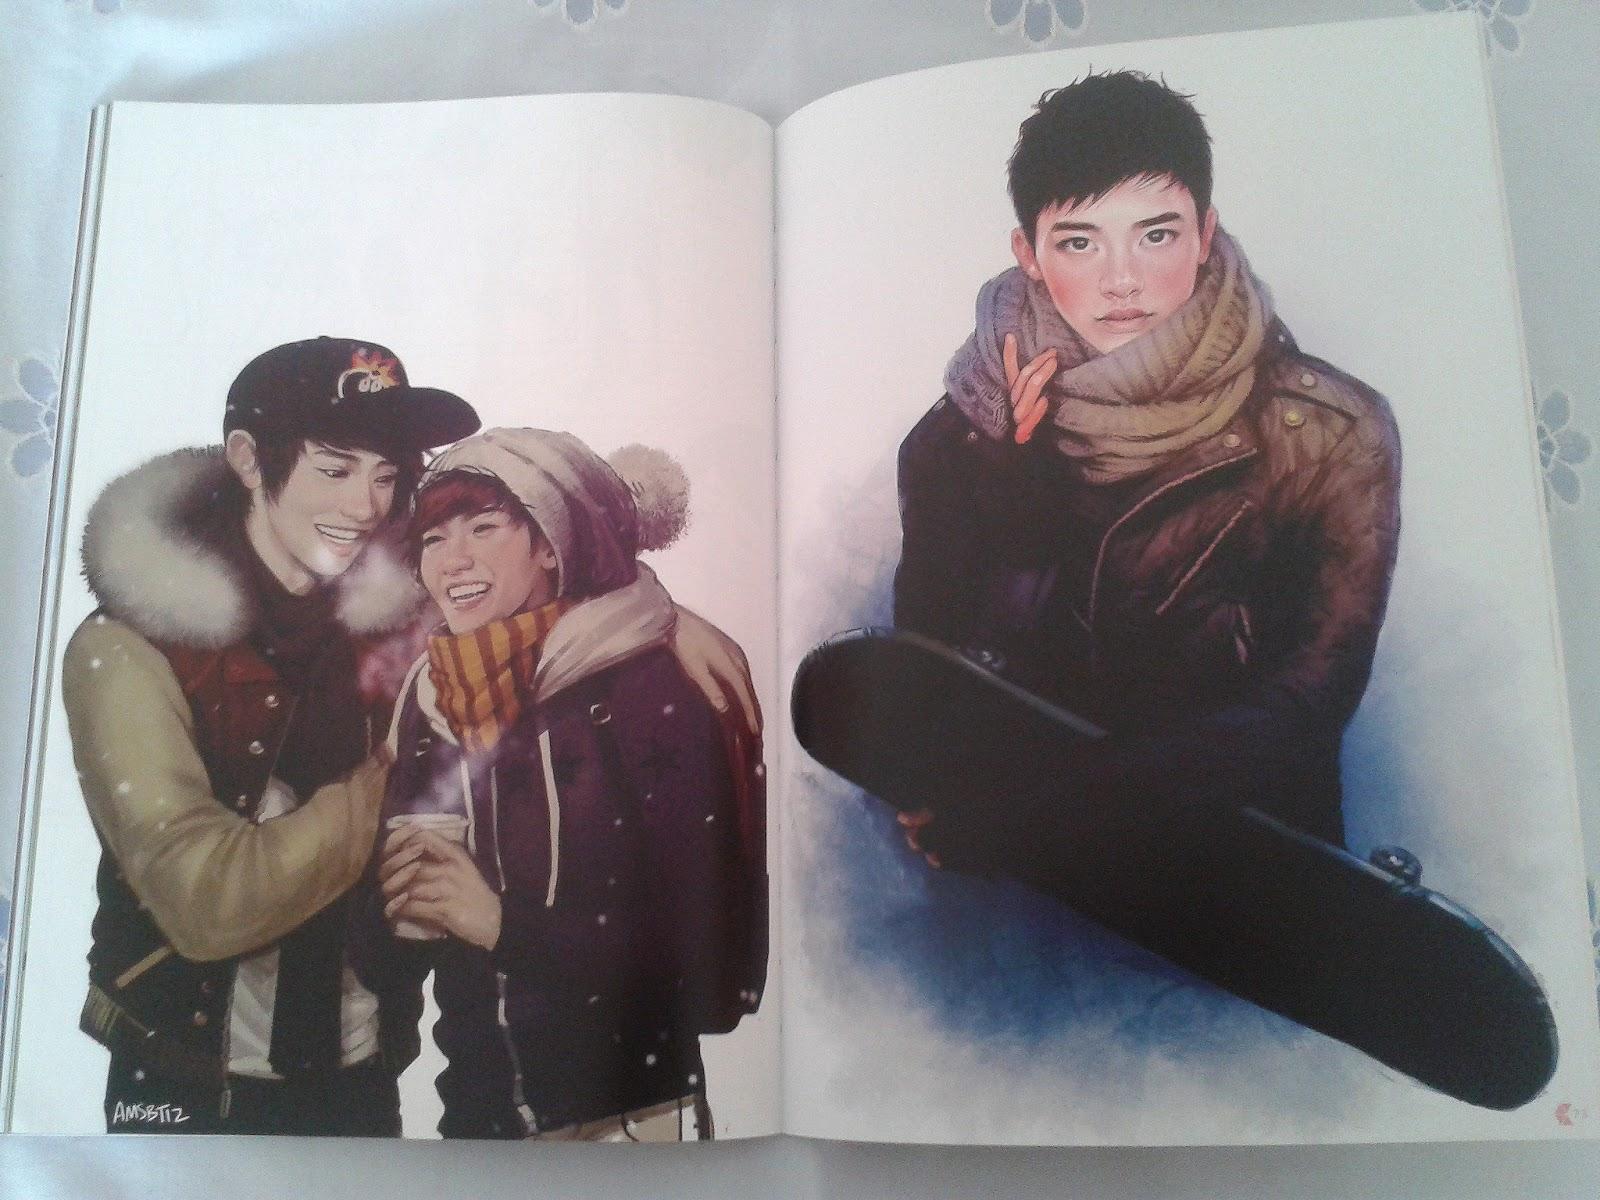 Nice Kpop Exo Sehun Chanyeol Xiumin Baekhyun D.o Kai Chen Lay Suho Fanart Postcard Post Cards Sticker Artbook Gift Cosplay Book Set Attractive Designs; Costume Props Novelty & Special Use